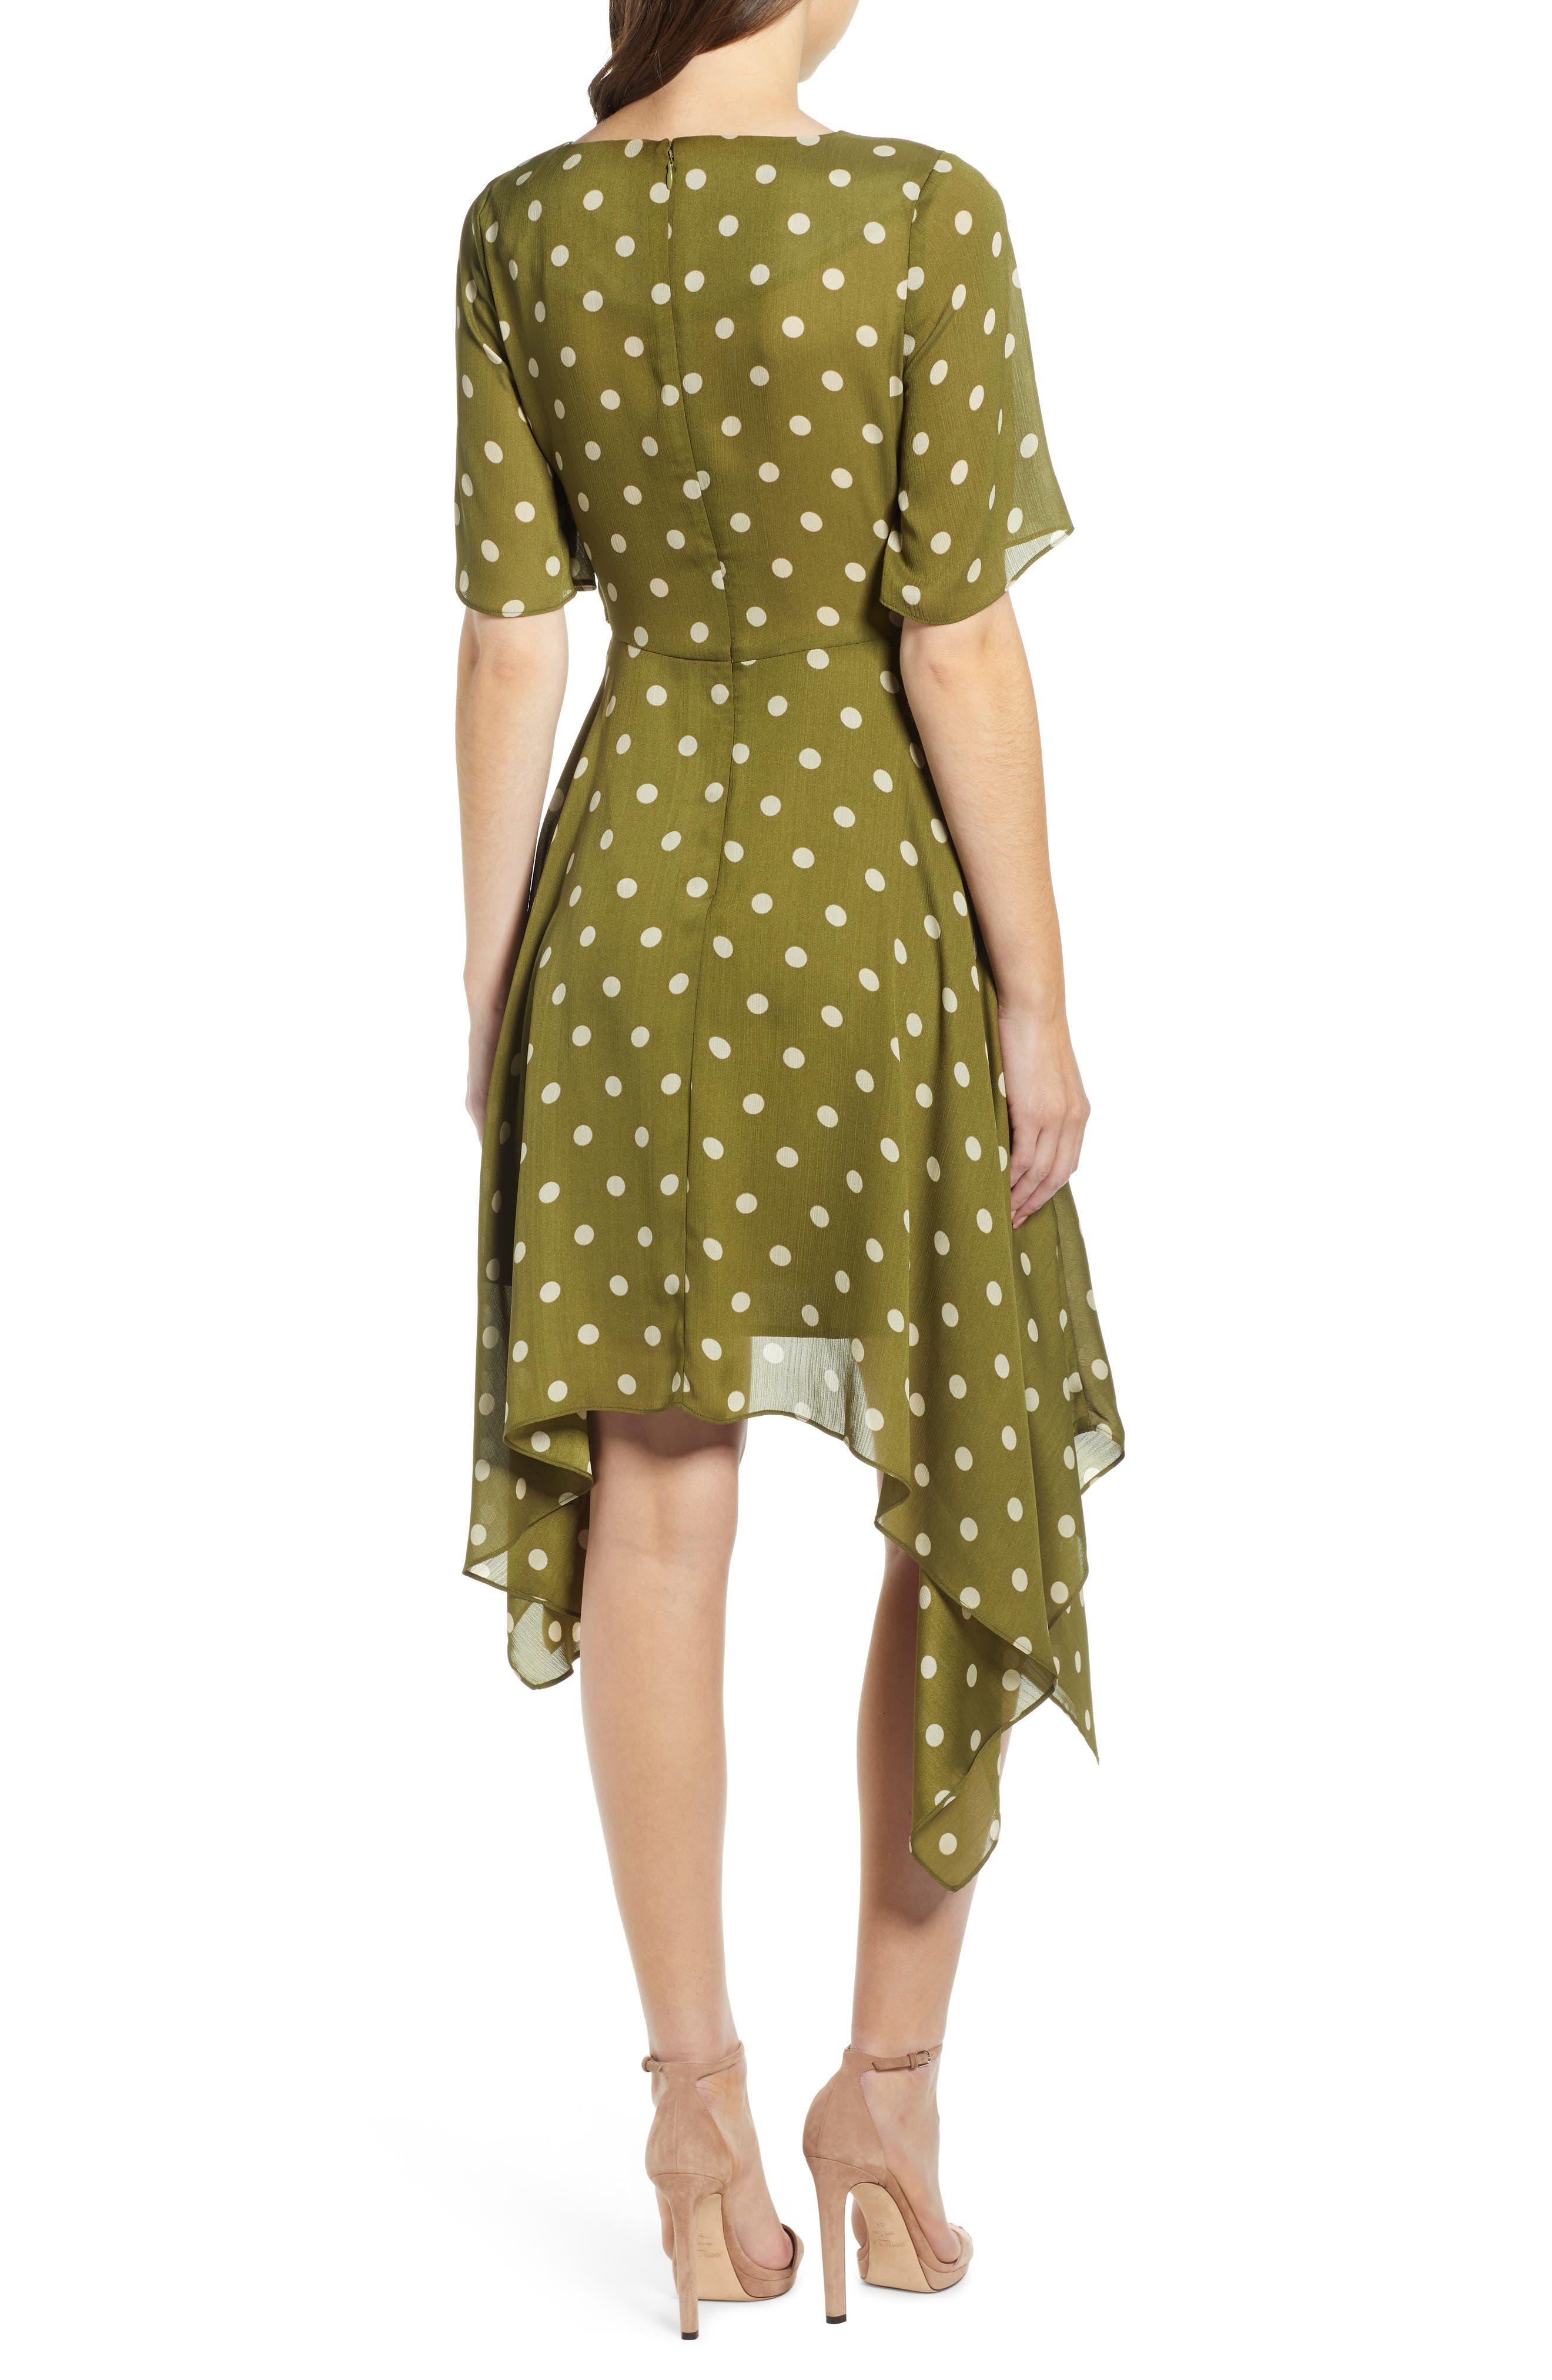 CHRISELLE LIM COLLECTION, Chriselle Lim Marie Handkerchief Hem Midi Dress, Alternate thumbnail 2, color, CREAM/ OLIVE